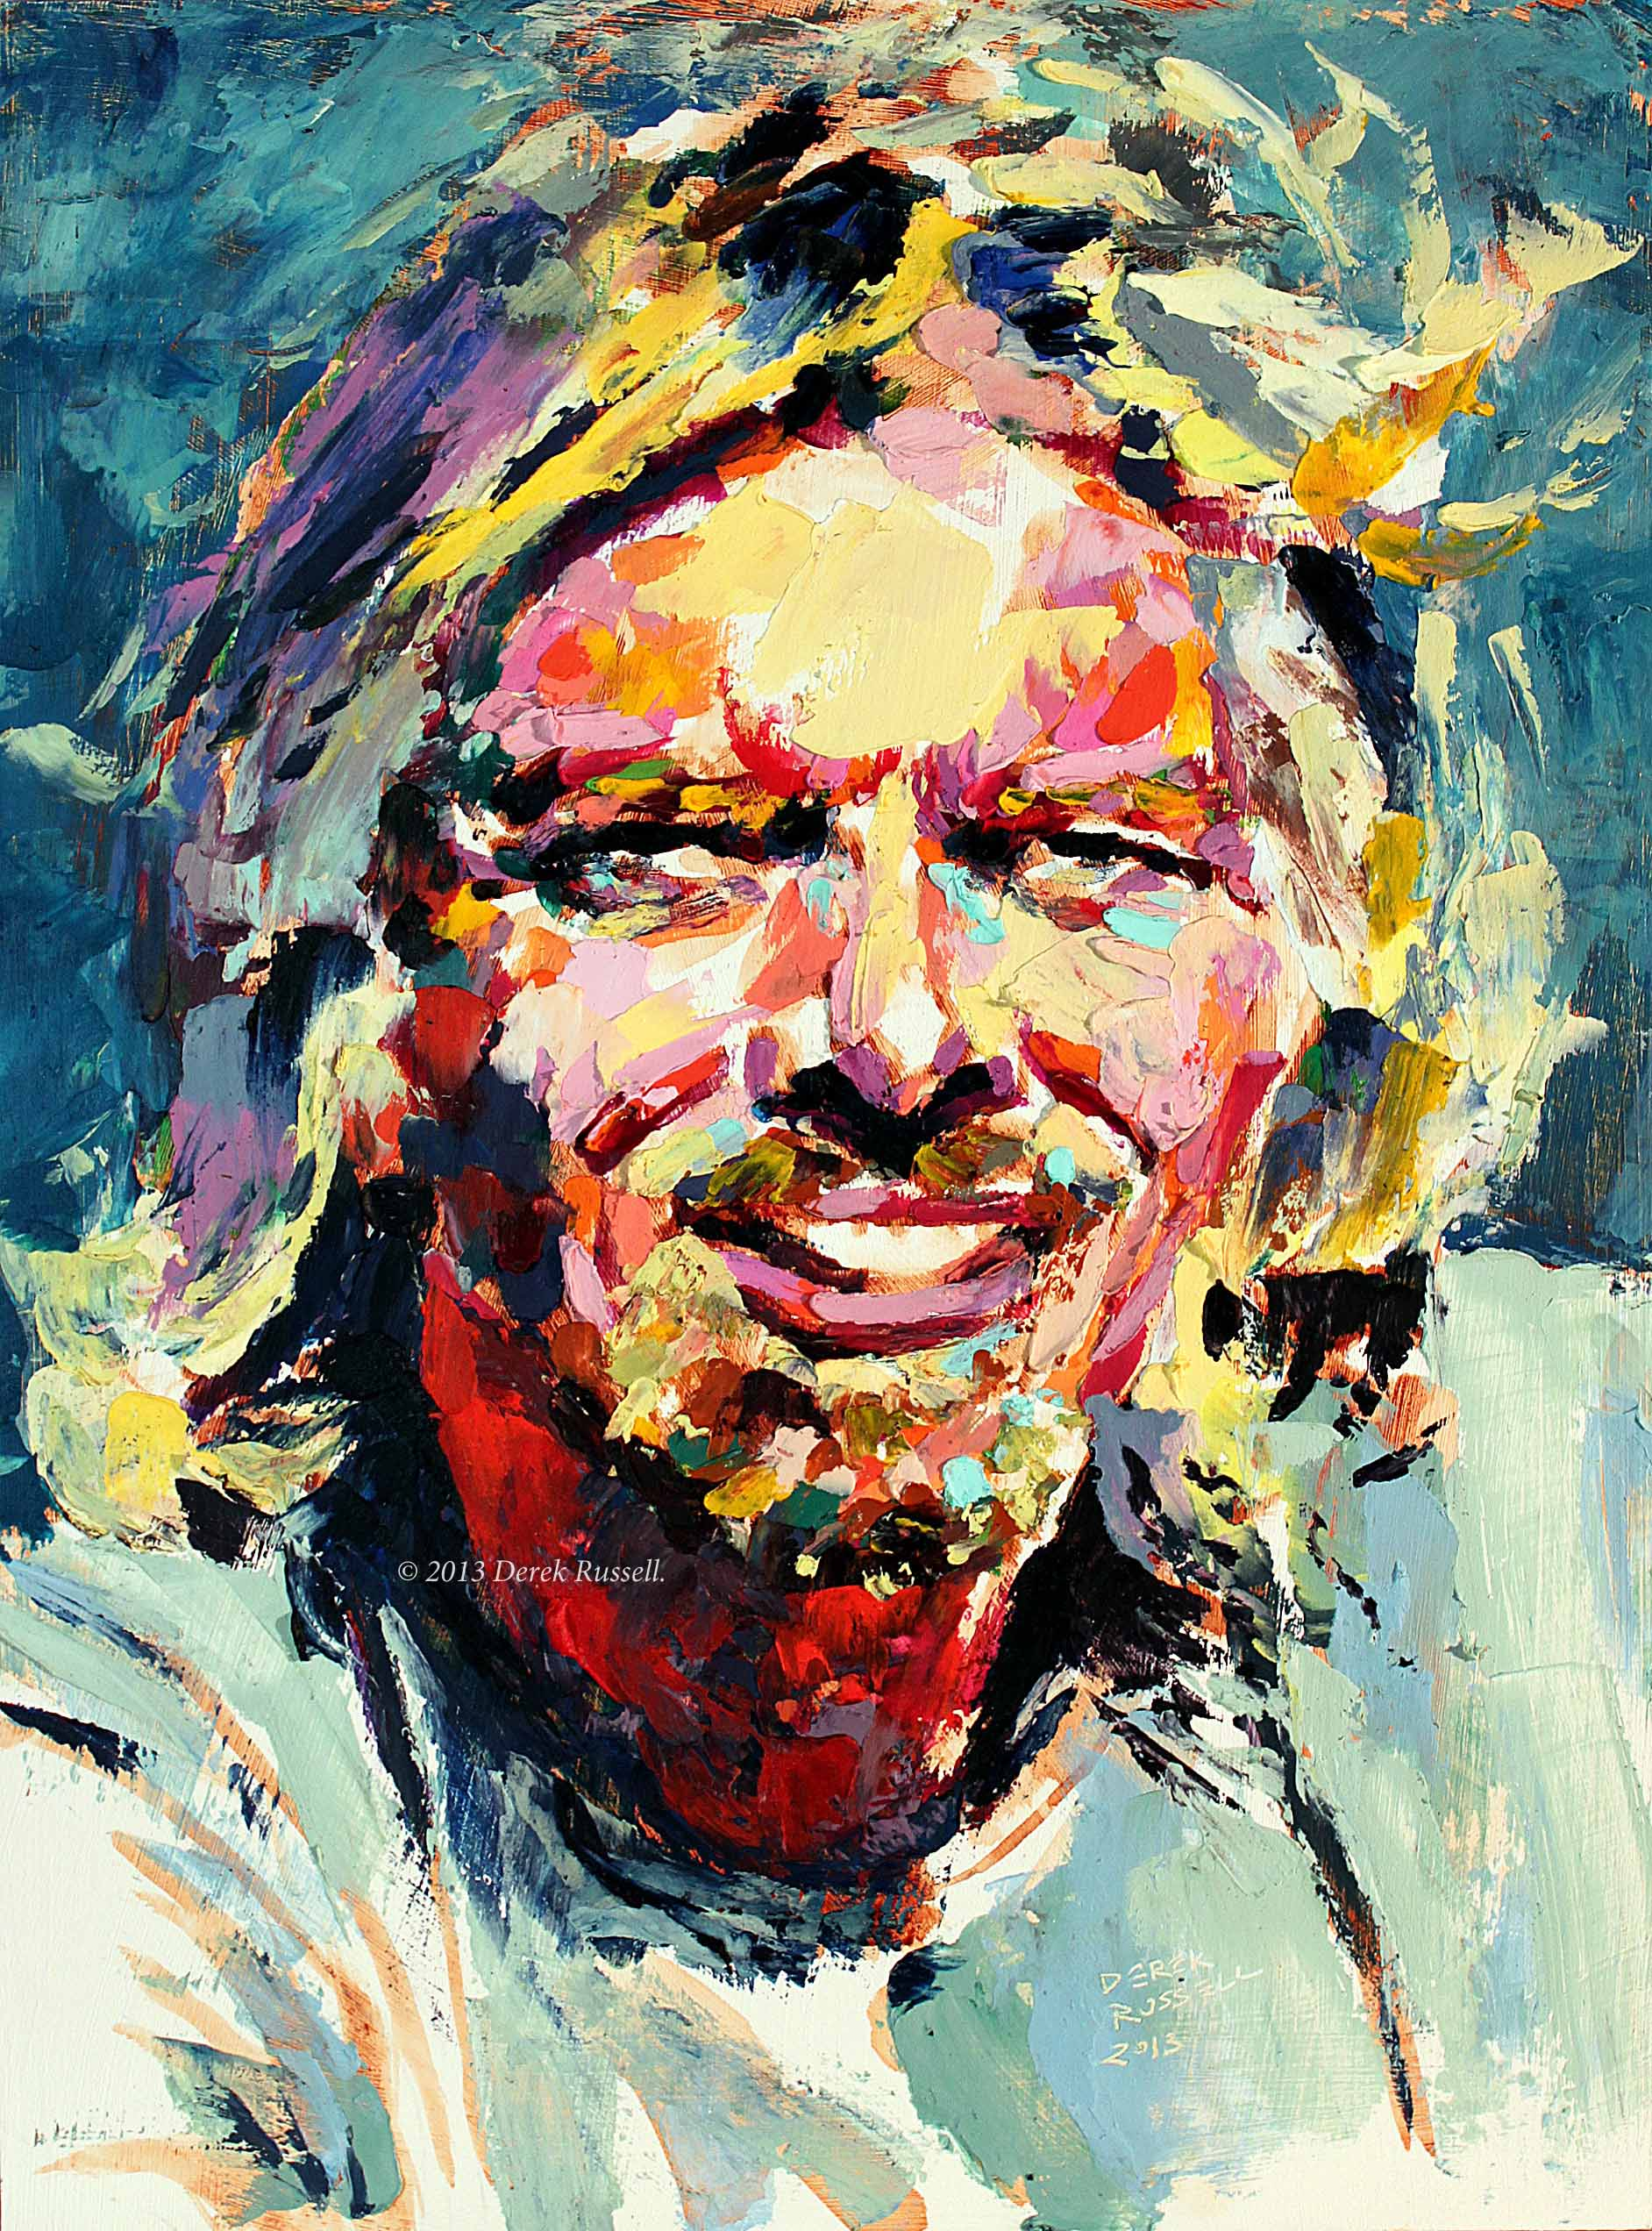 Richard Branson Original Portrait Pop Art Painting by Derek Russell